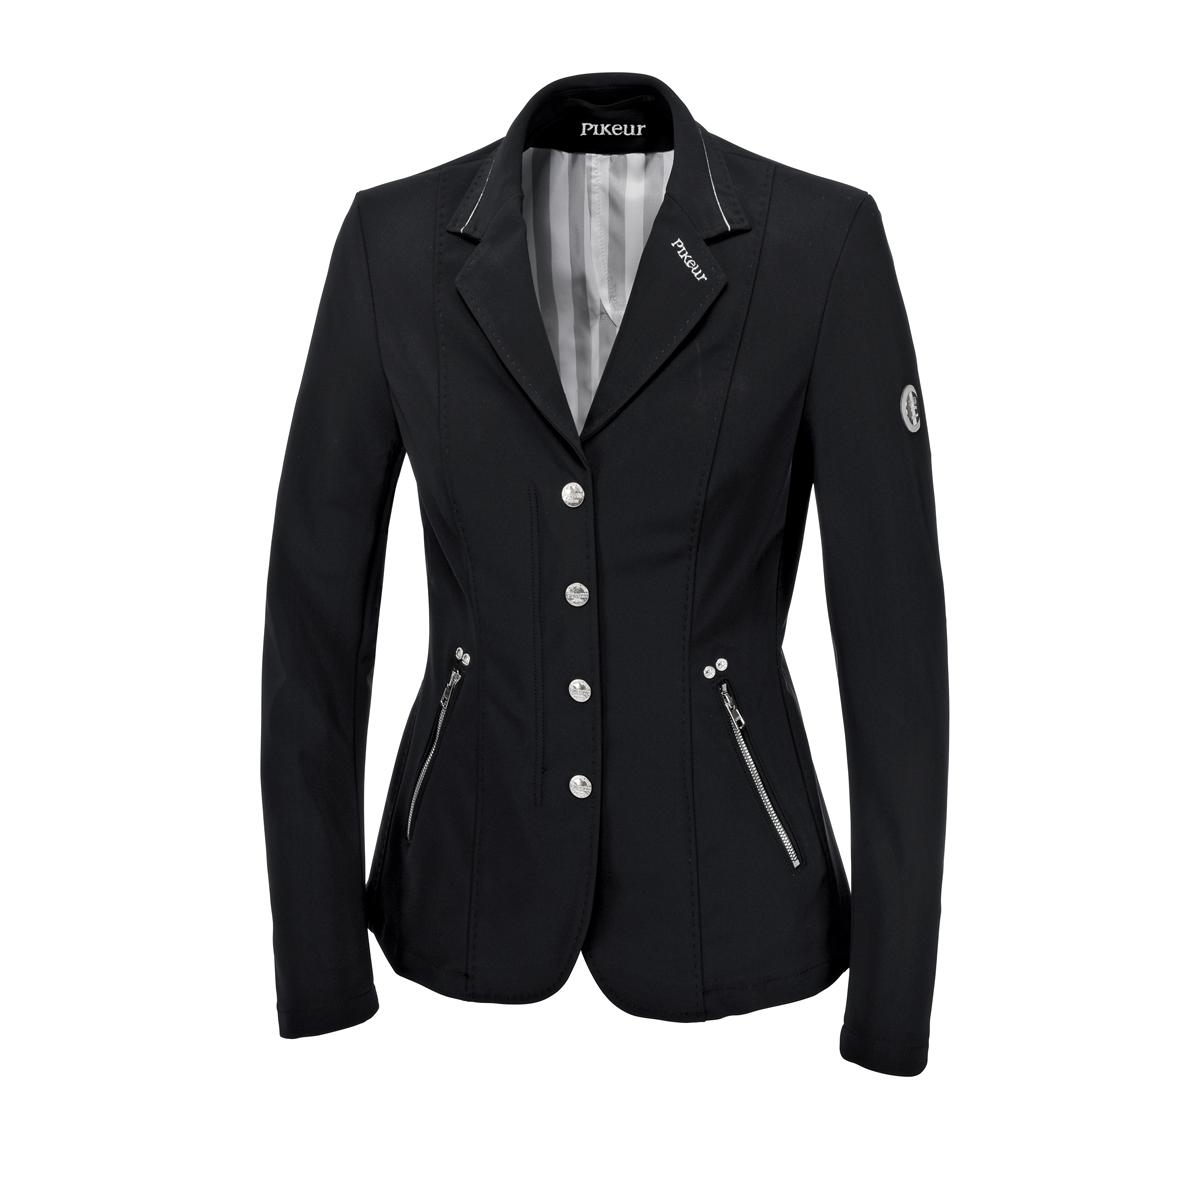 pikeur_quibelle_jacket_black